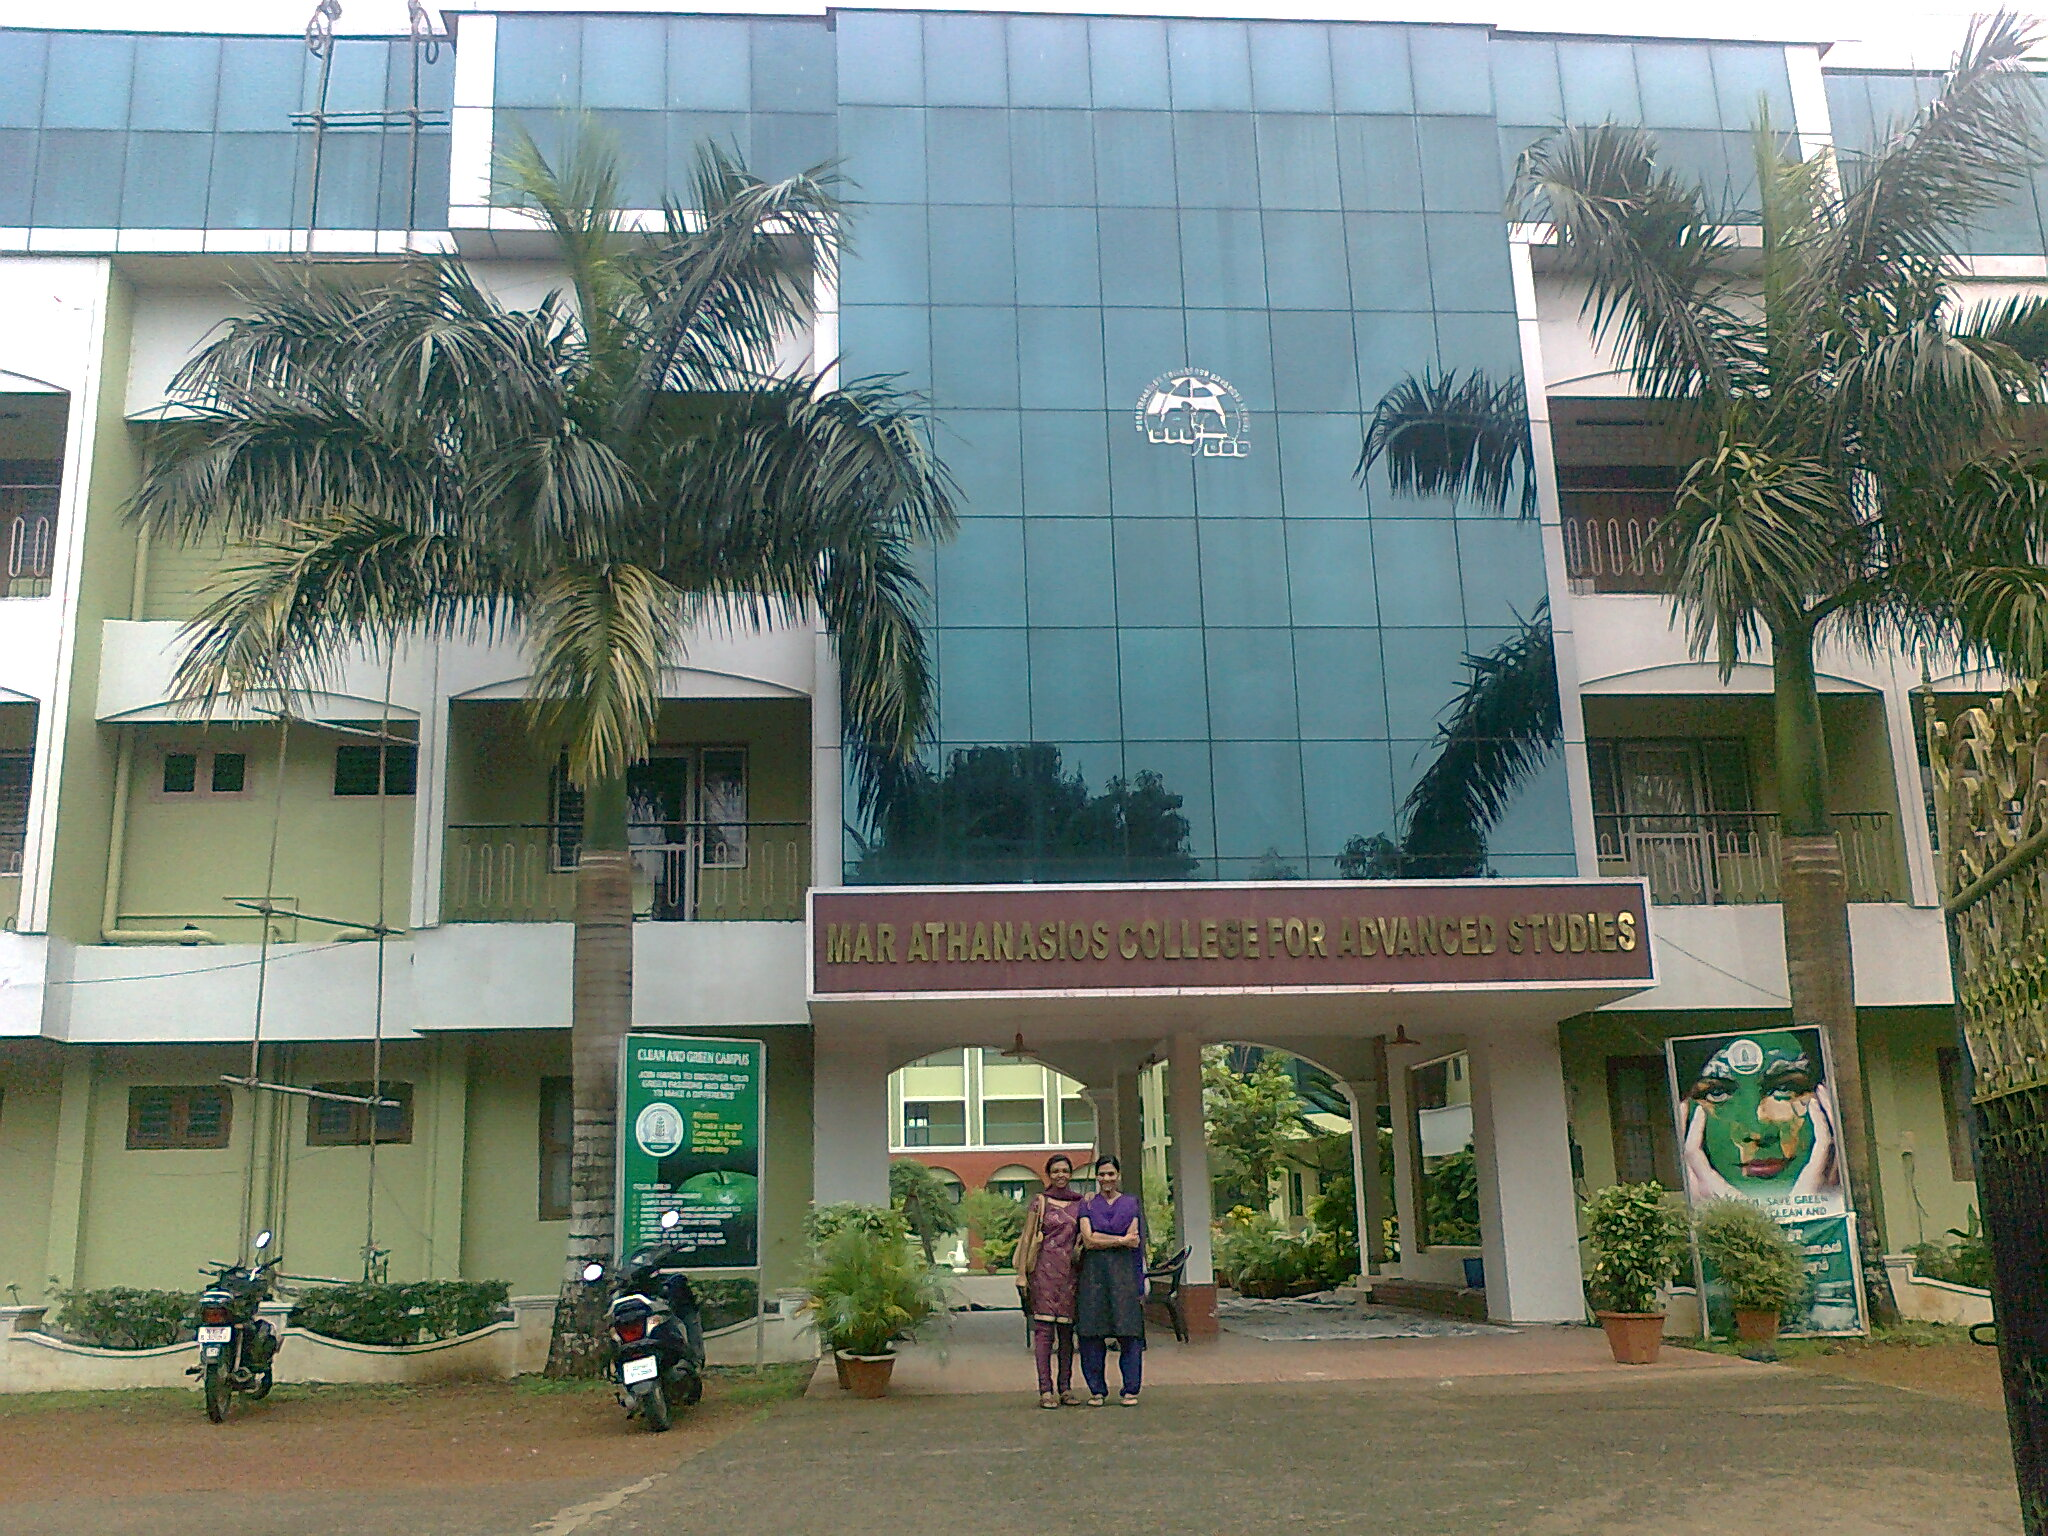 Mar Athanasios College for Advanced Studies Tiruvalla, Pathanamthitta